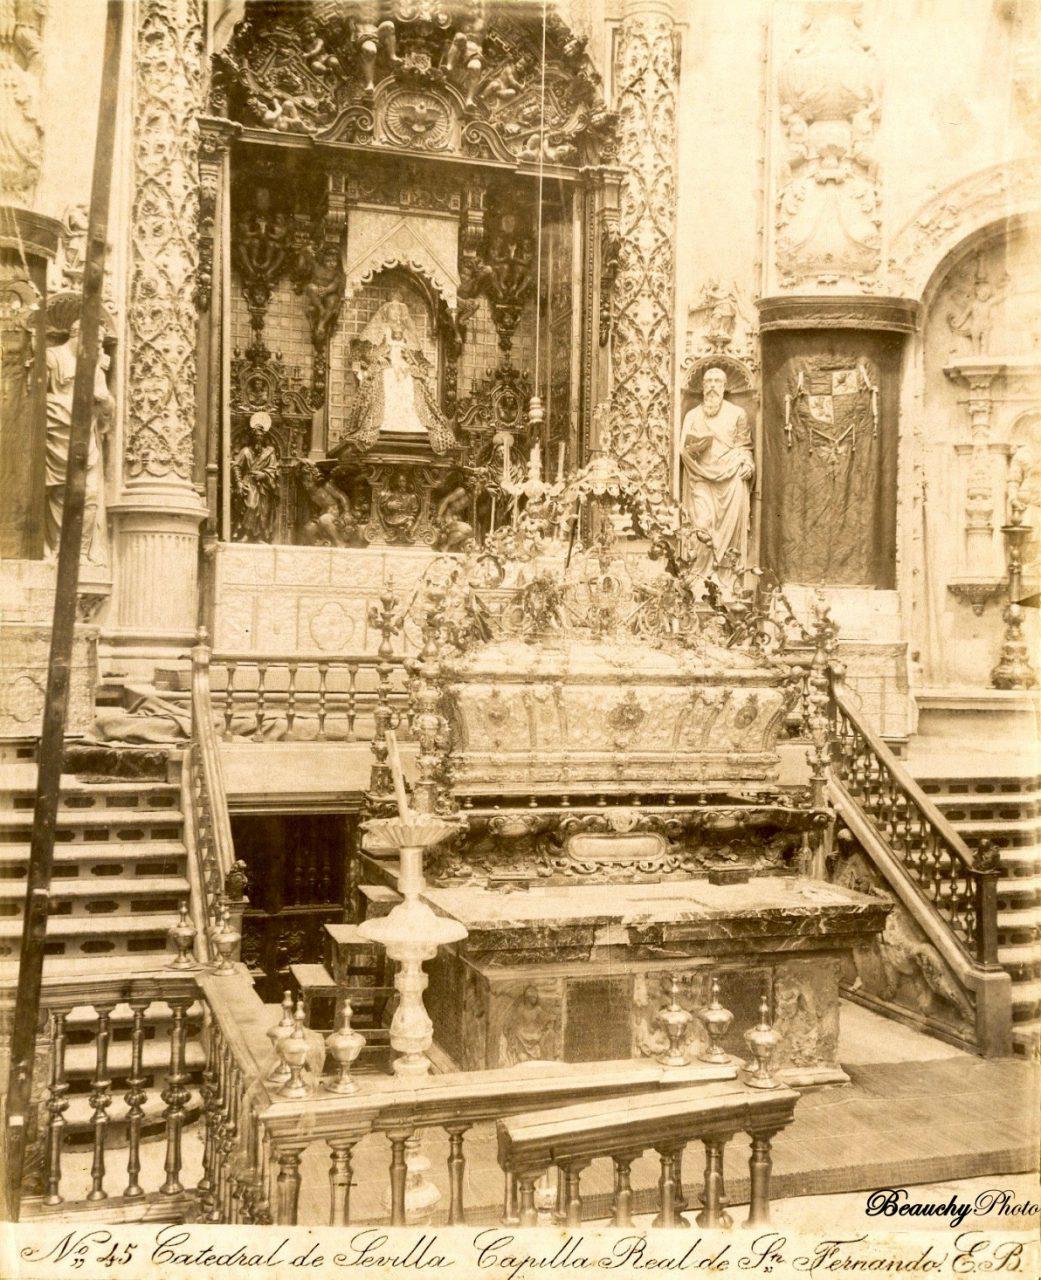 Beauchyphoto_Catedral_de_Sevilla_Capilla_Real_de_San_Fernando_c.1880_Emilio_Beauchy_Cano_fotografias_antiguas_postales_vistas_y_monumentos